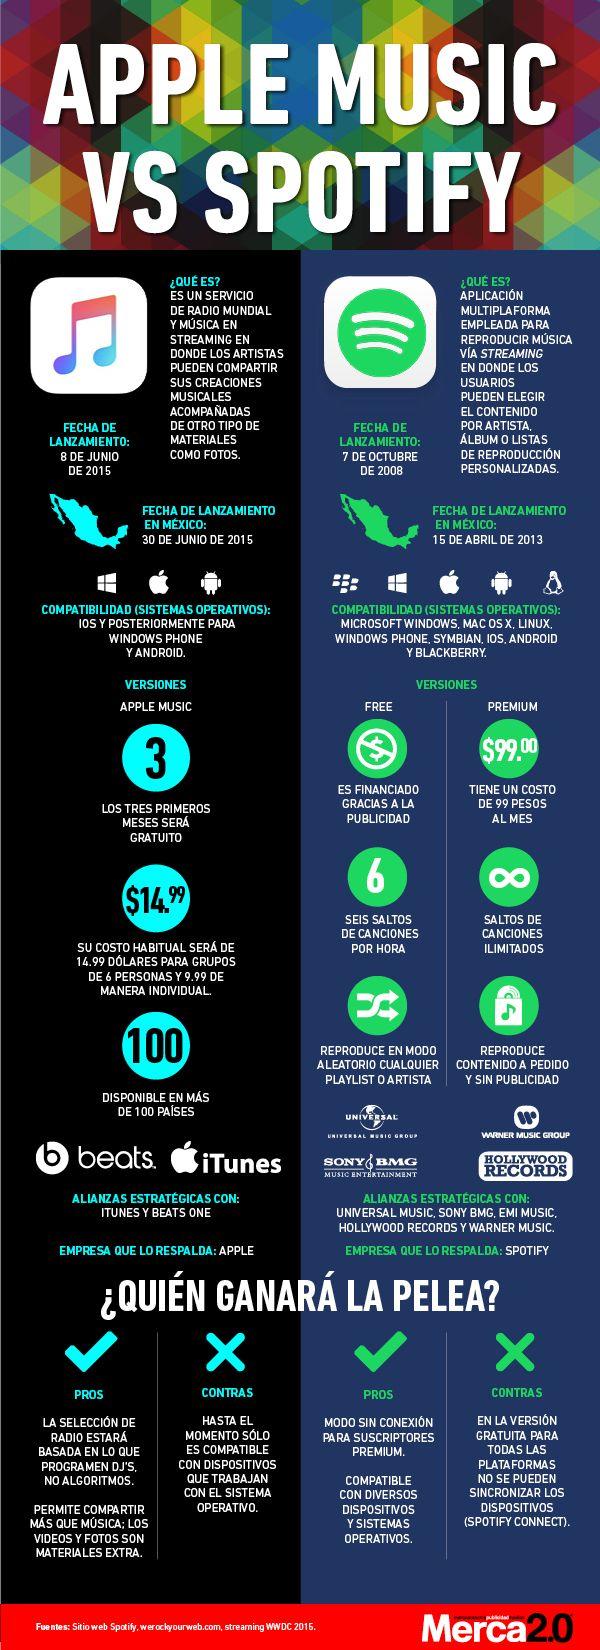 Infografía Apple Music vs Spotify Infografia, Imágenes